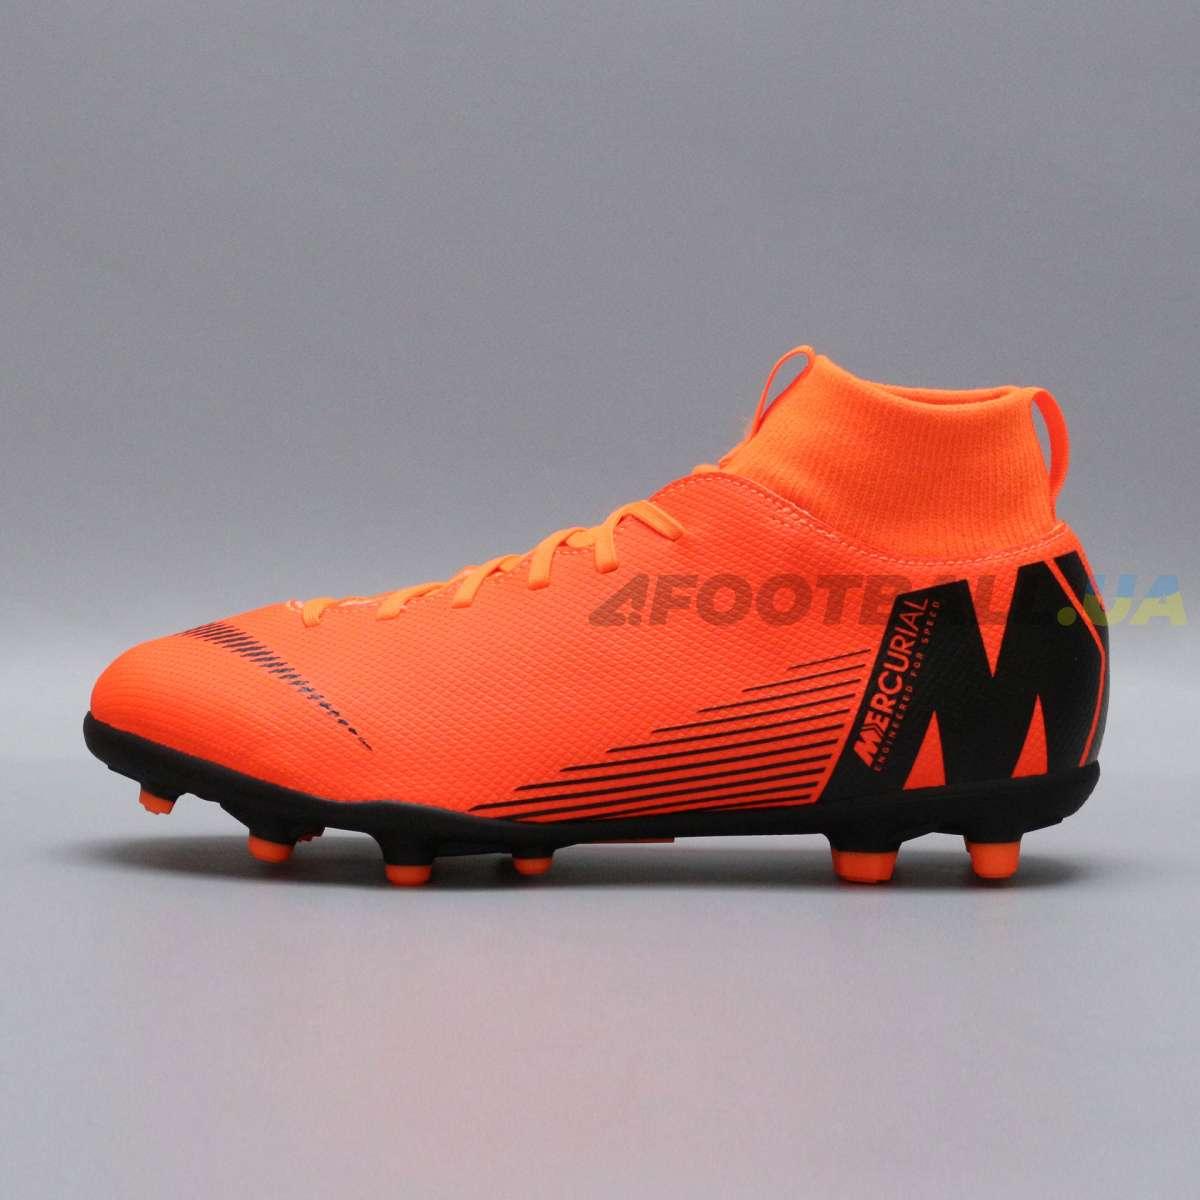 5d7b5bb6 Детские бутсы Nike Mercurial SUPERFLY CLUB AH7339-810 купить на ...